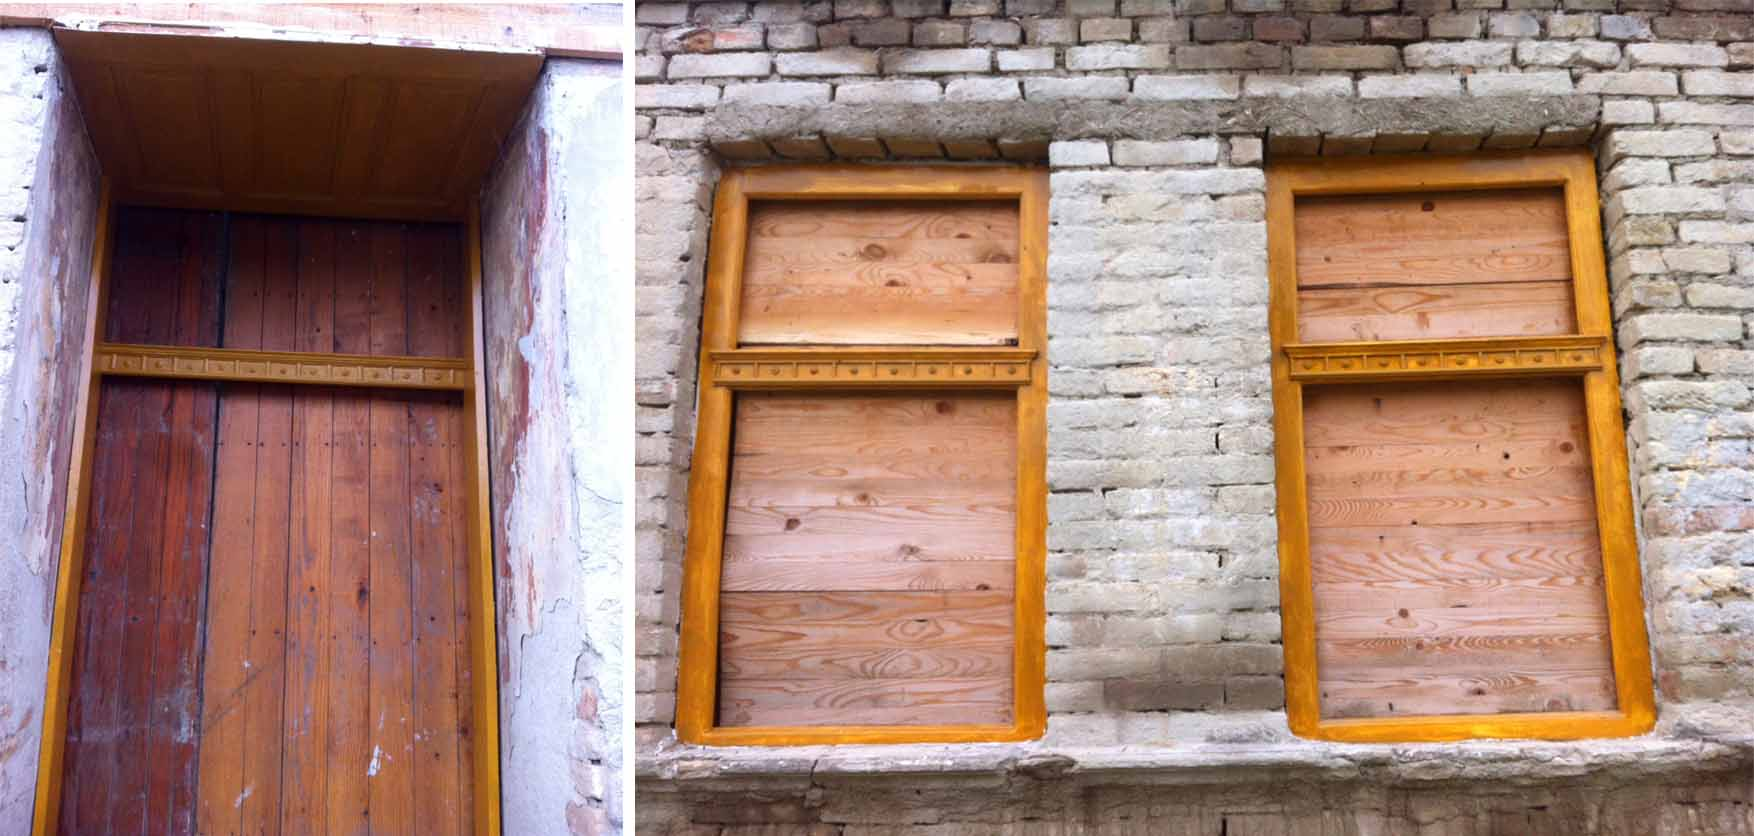 04 Mosorin radionica Gorjana i ekipa farbanje okvira vrata i prozora